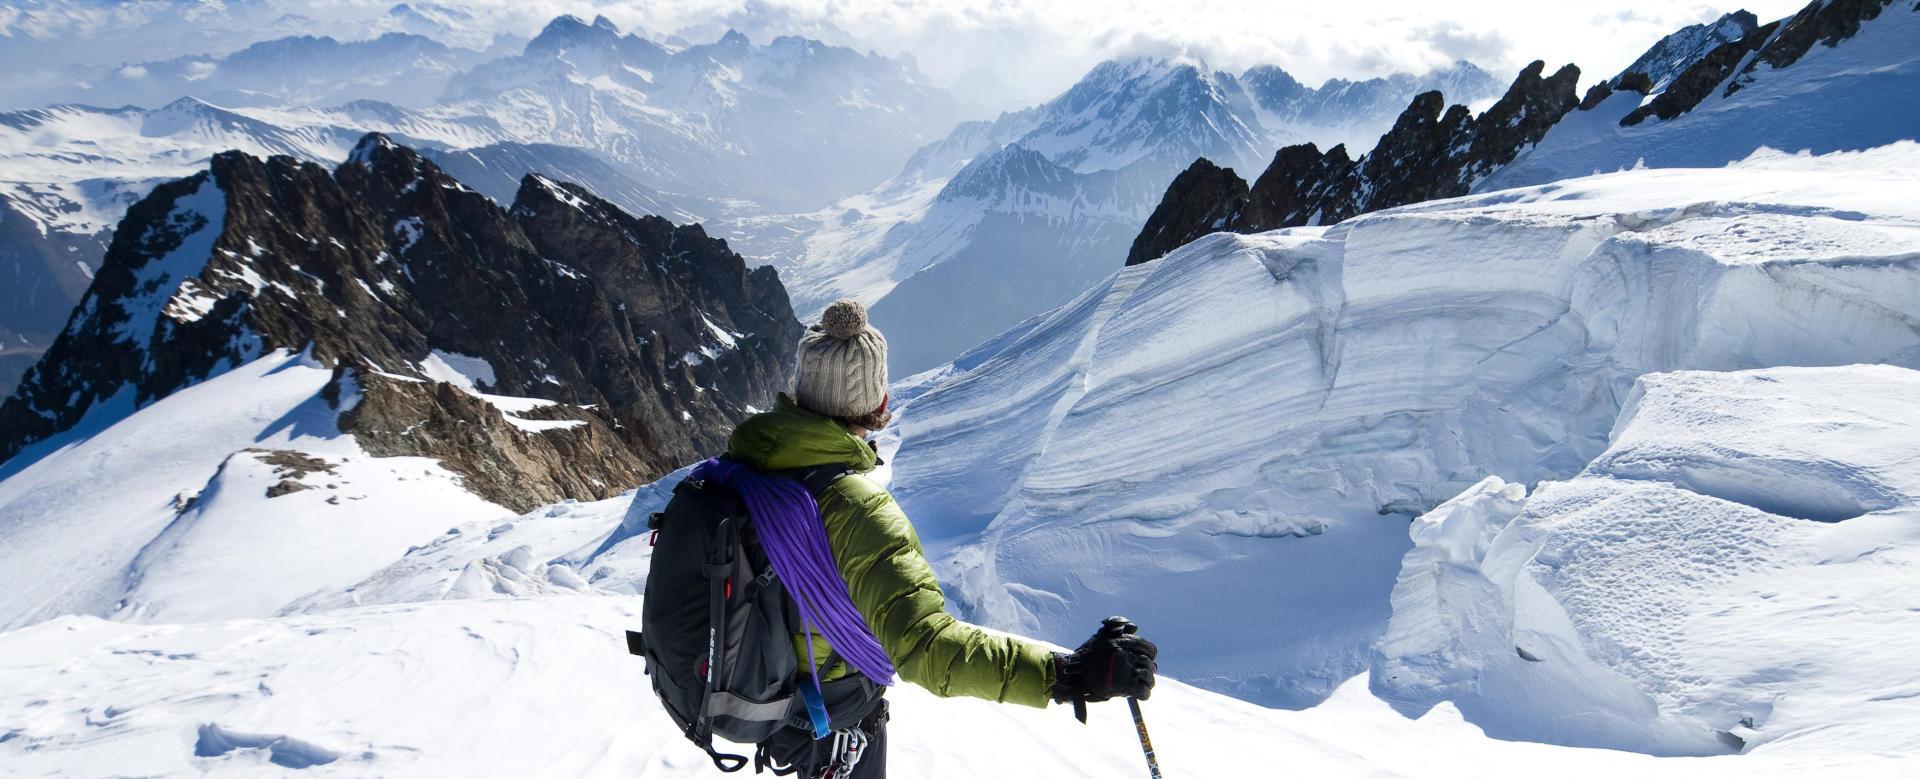 Voyage à la neige : Tour de la meije à ski de rando